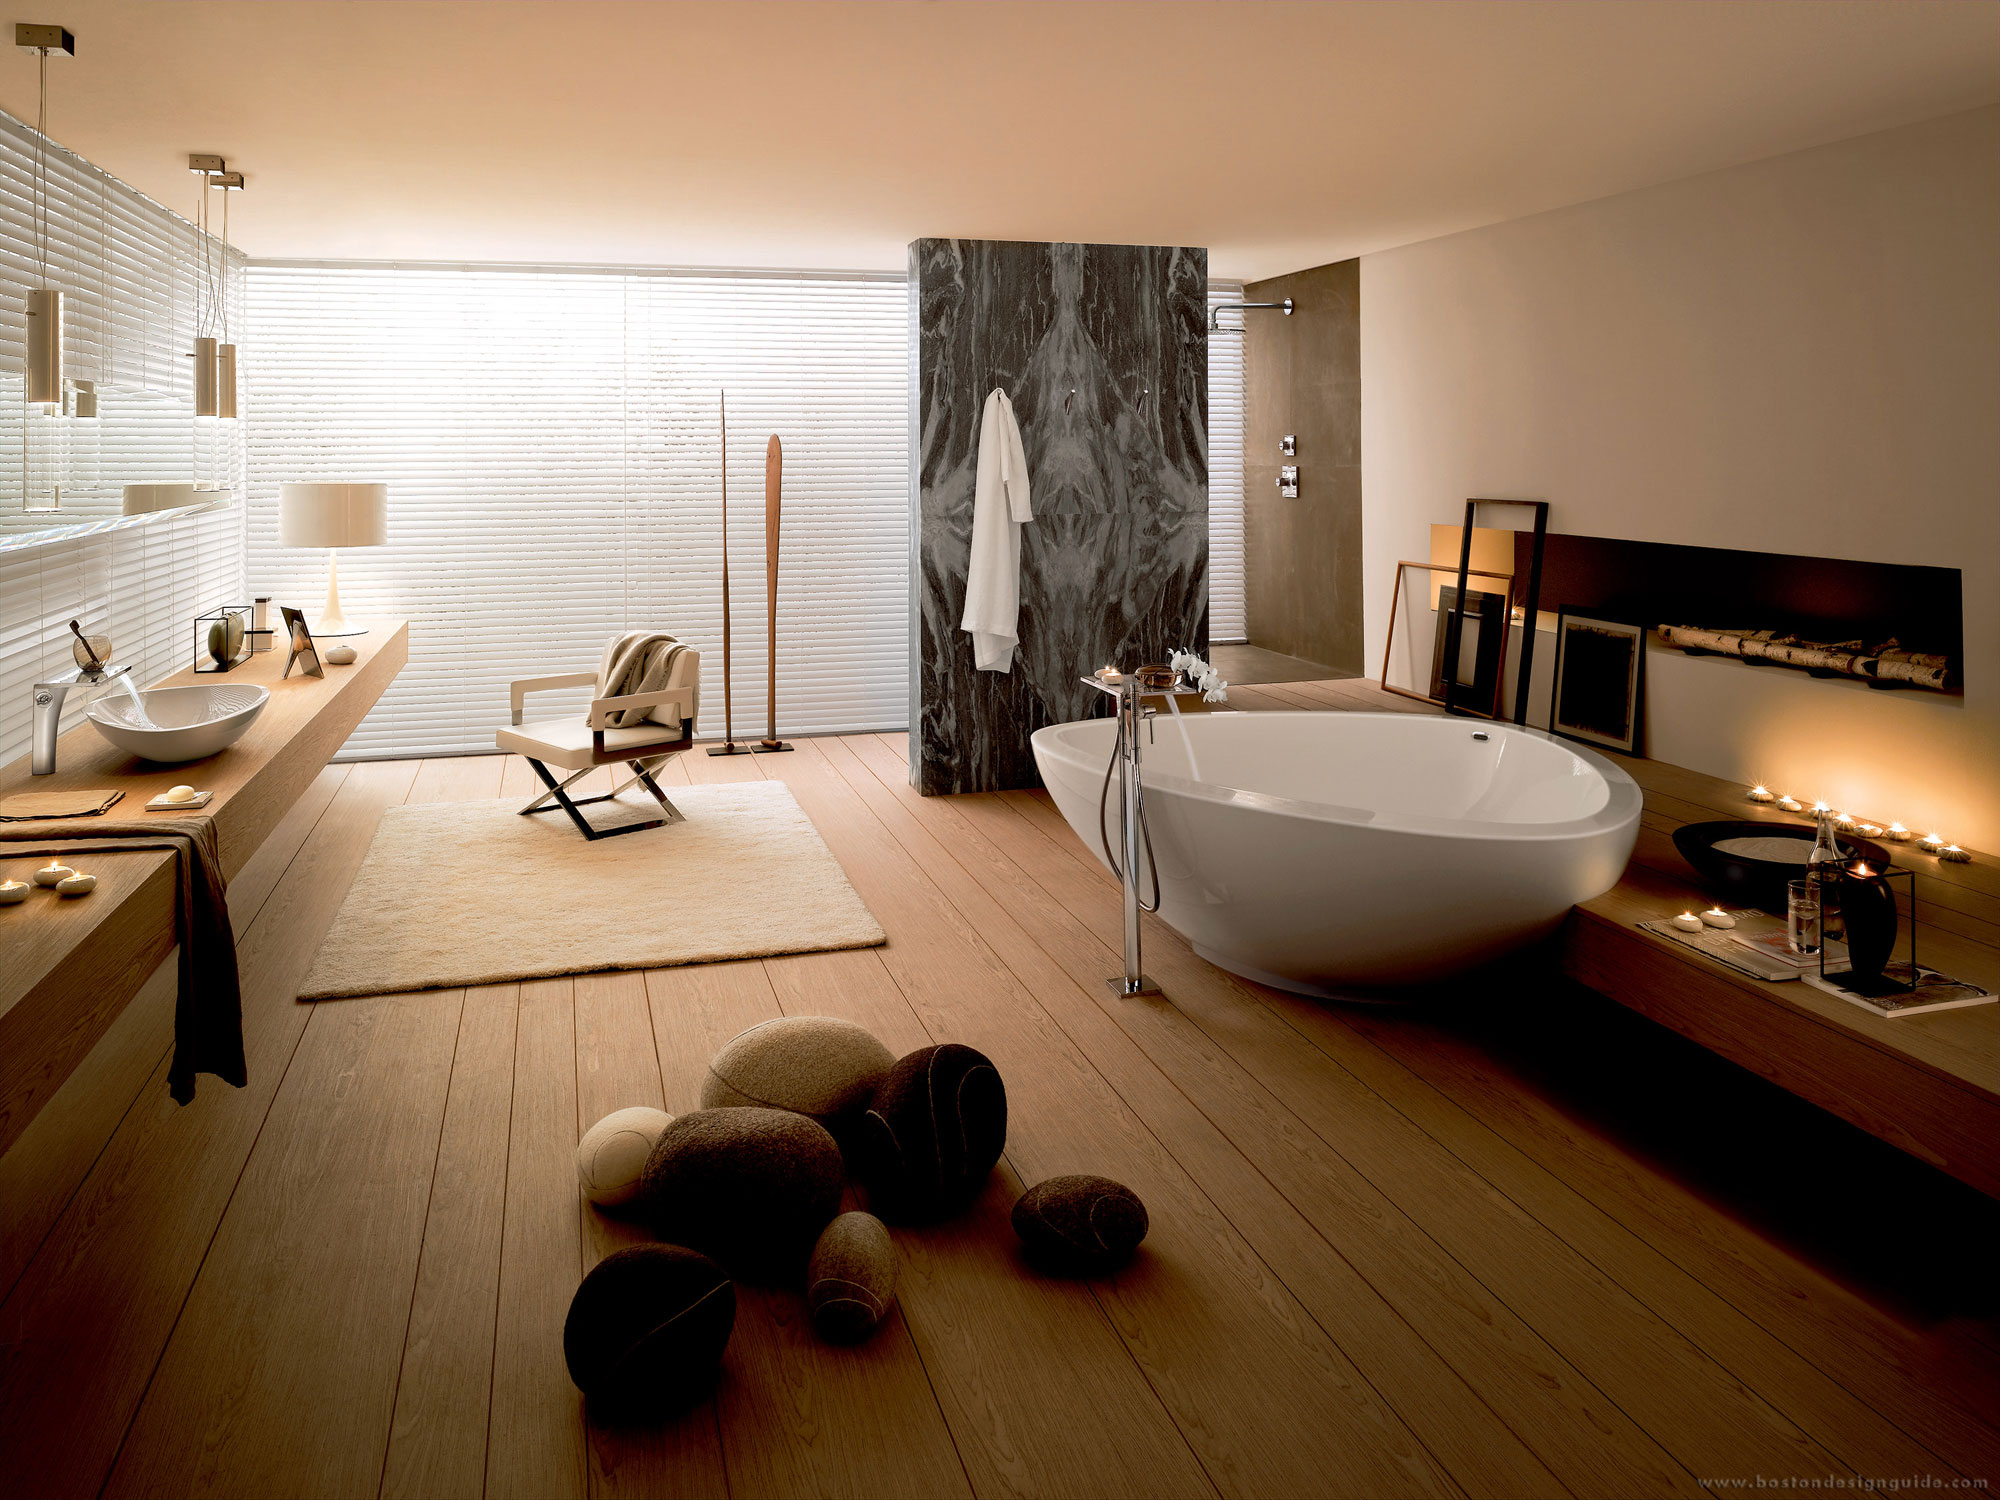 Jett Road Residence Bath by Beth Webb Interiors